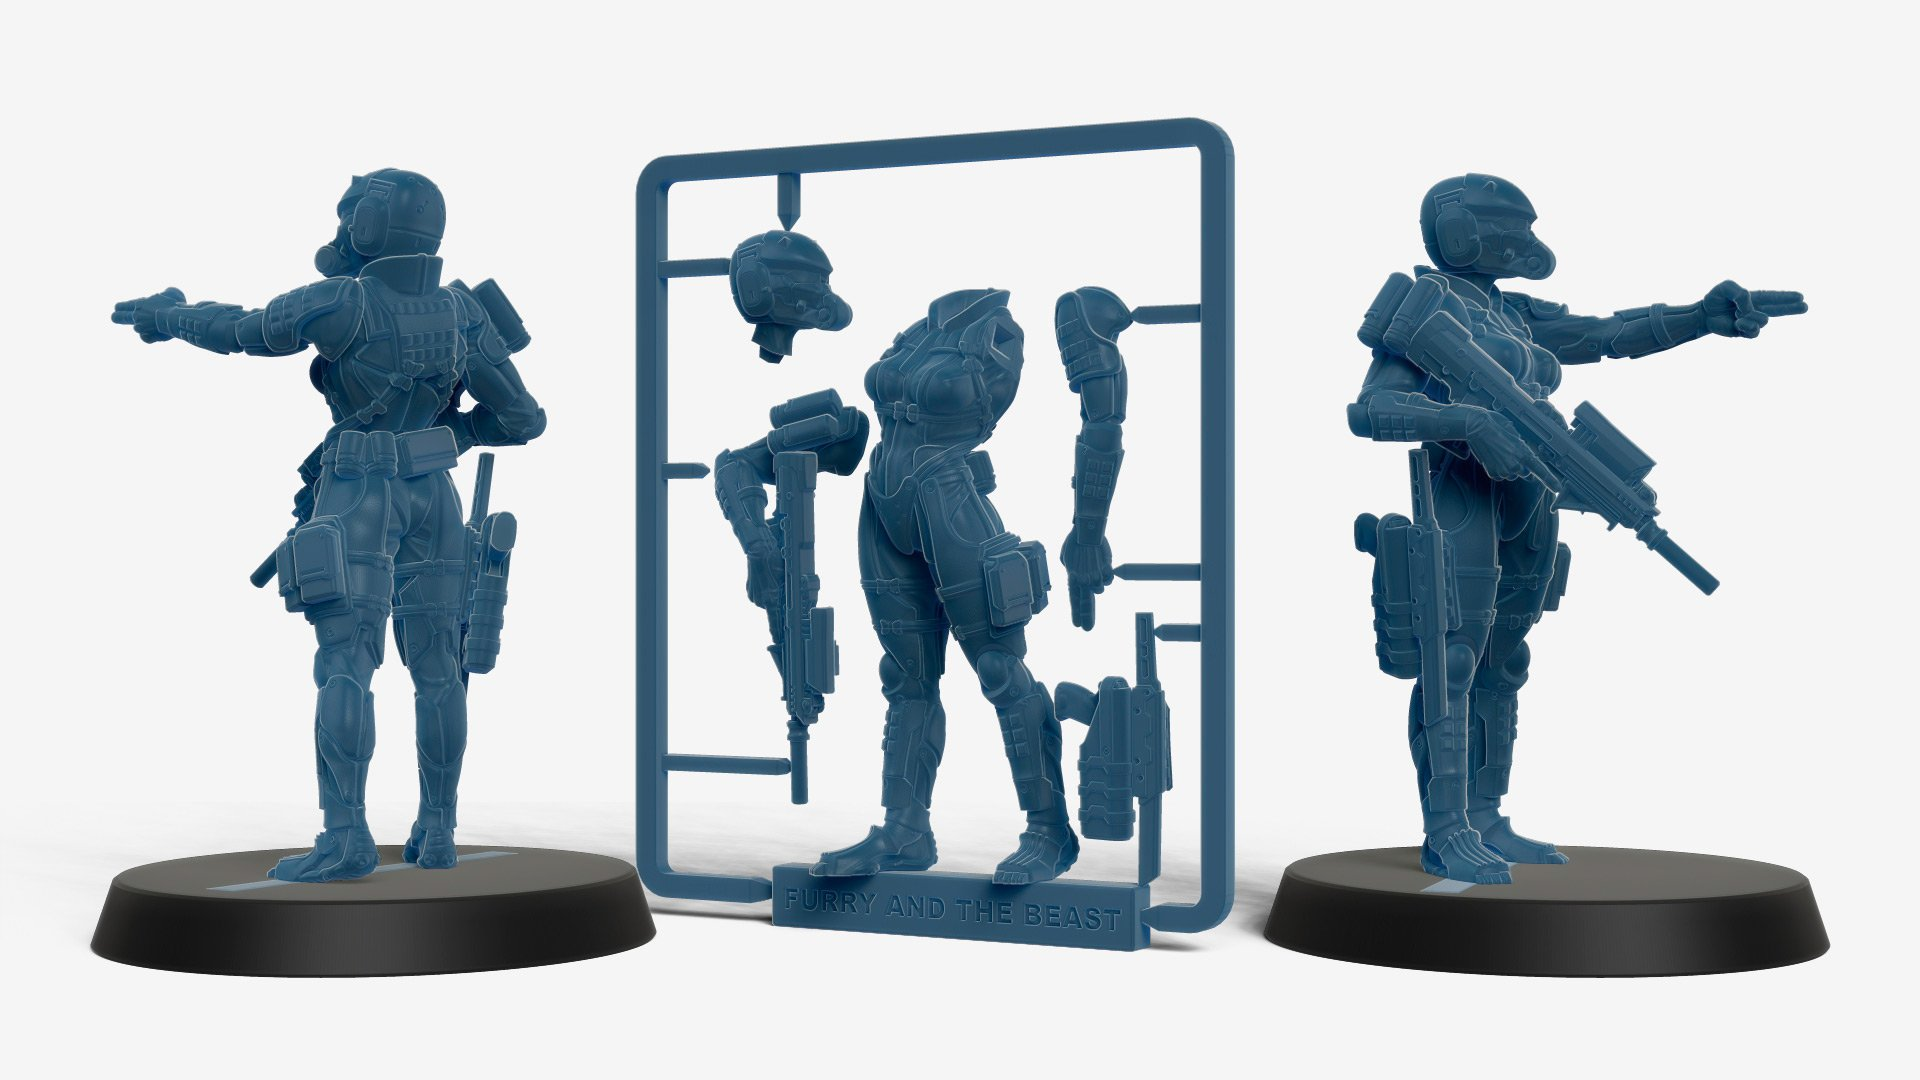 haven trooper female soldier miniature 3d printed in a sprue